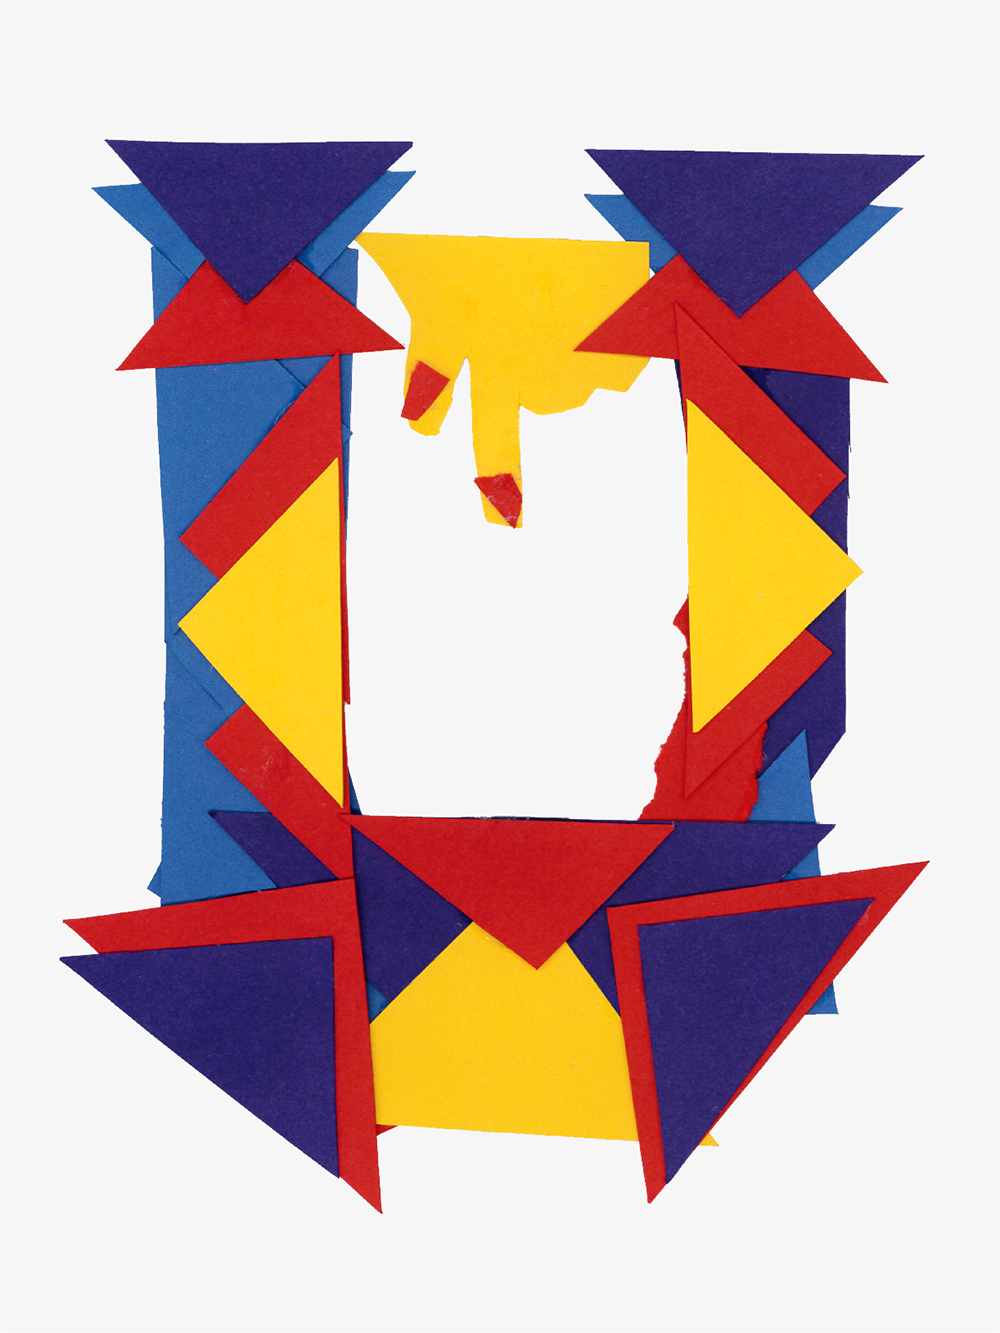 Gestalt_Invariance_FinalPoster-06.png